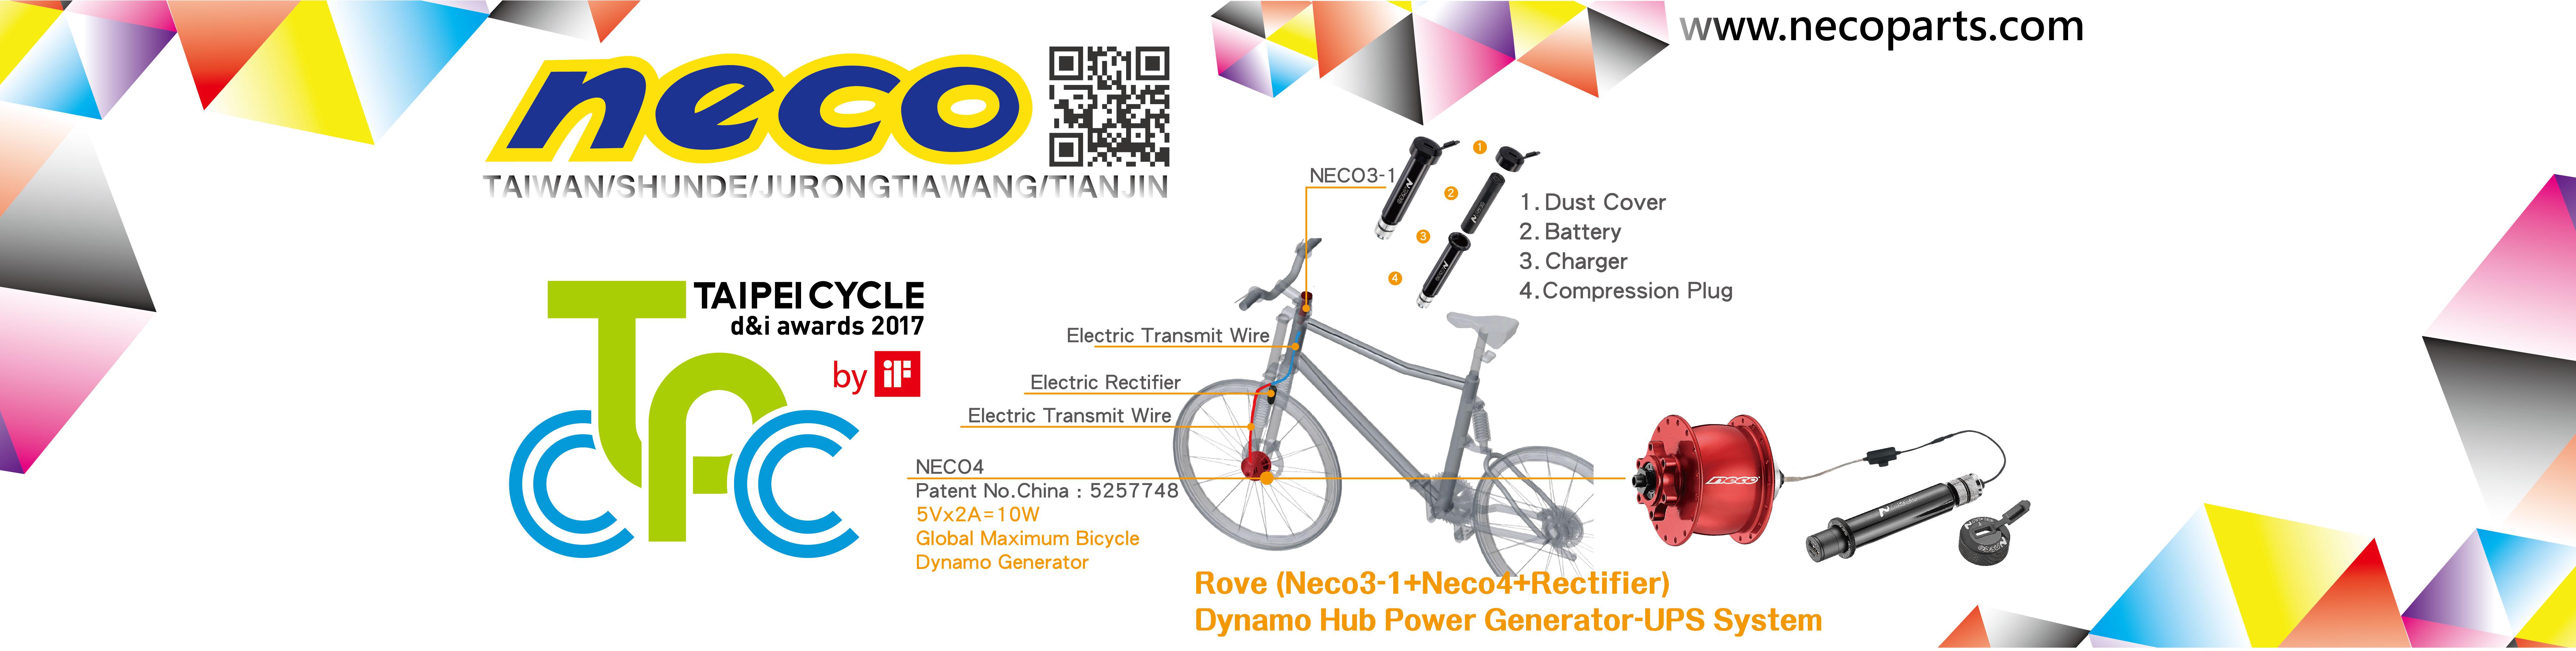 Neco - products